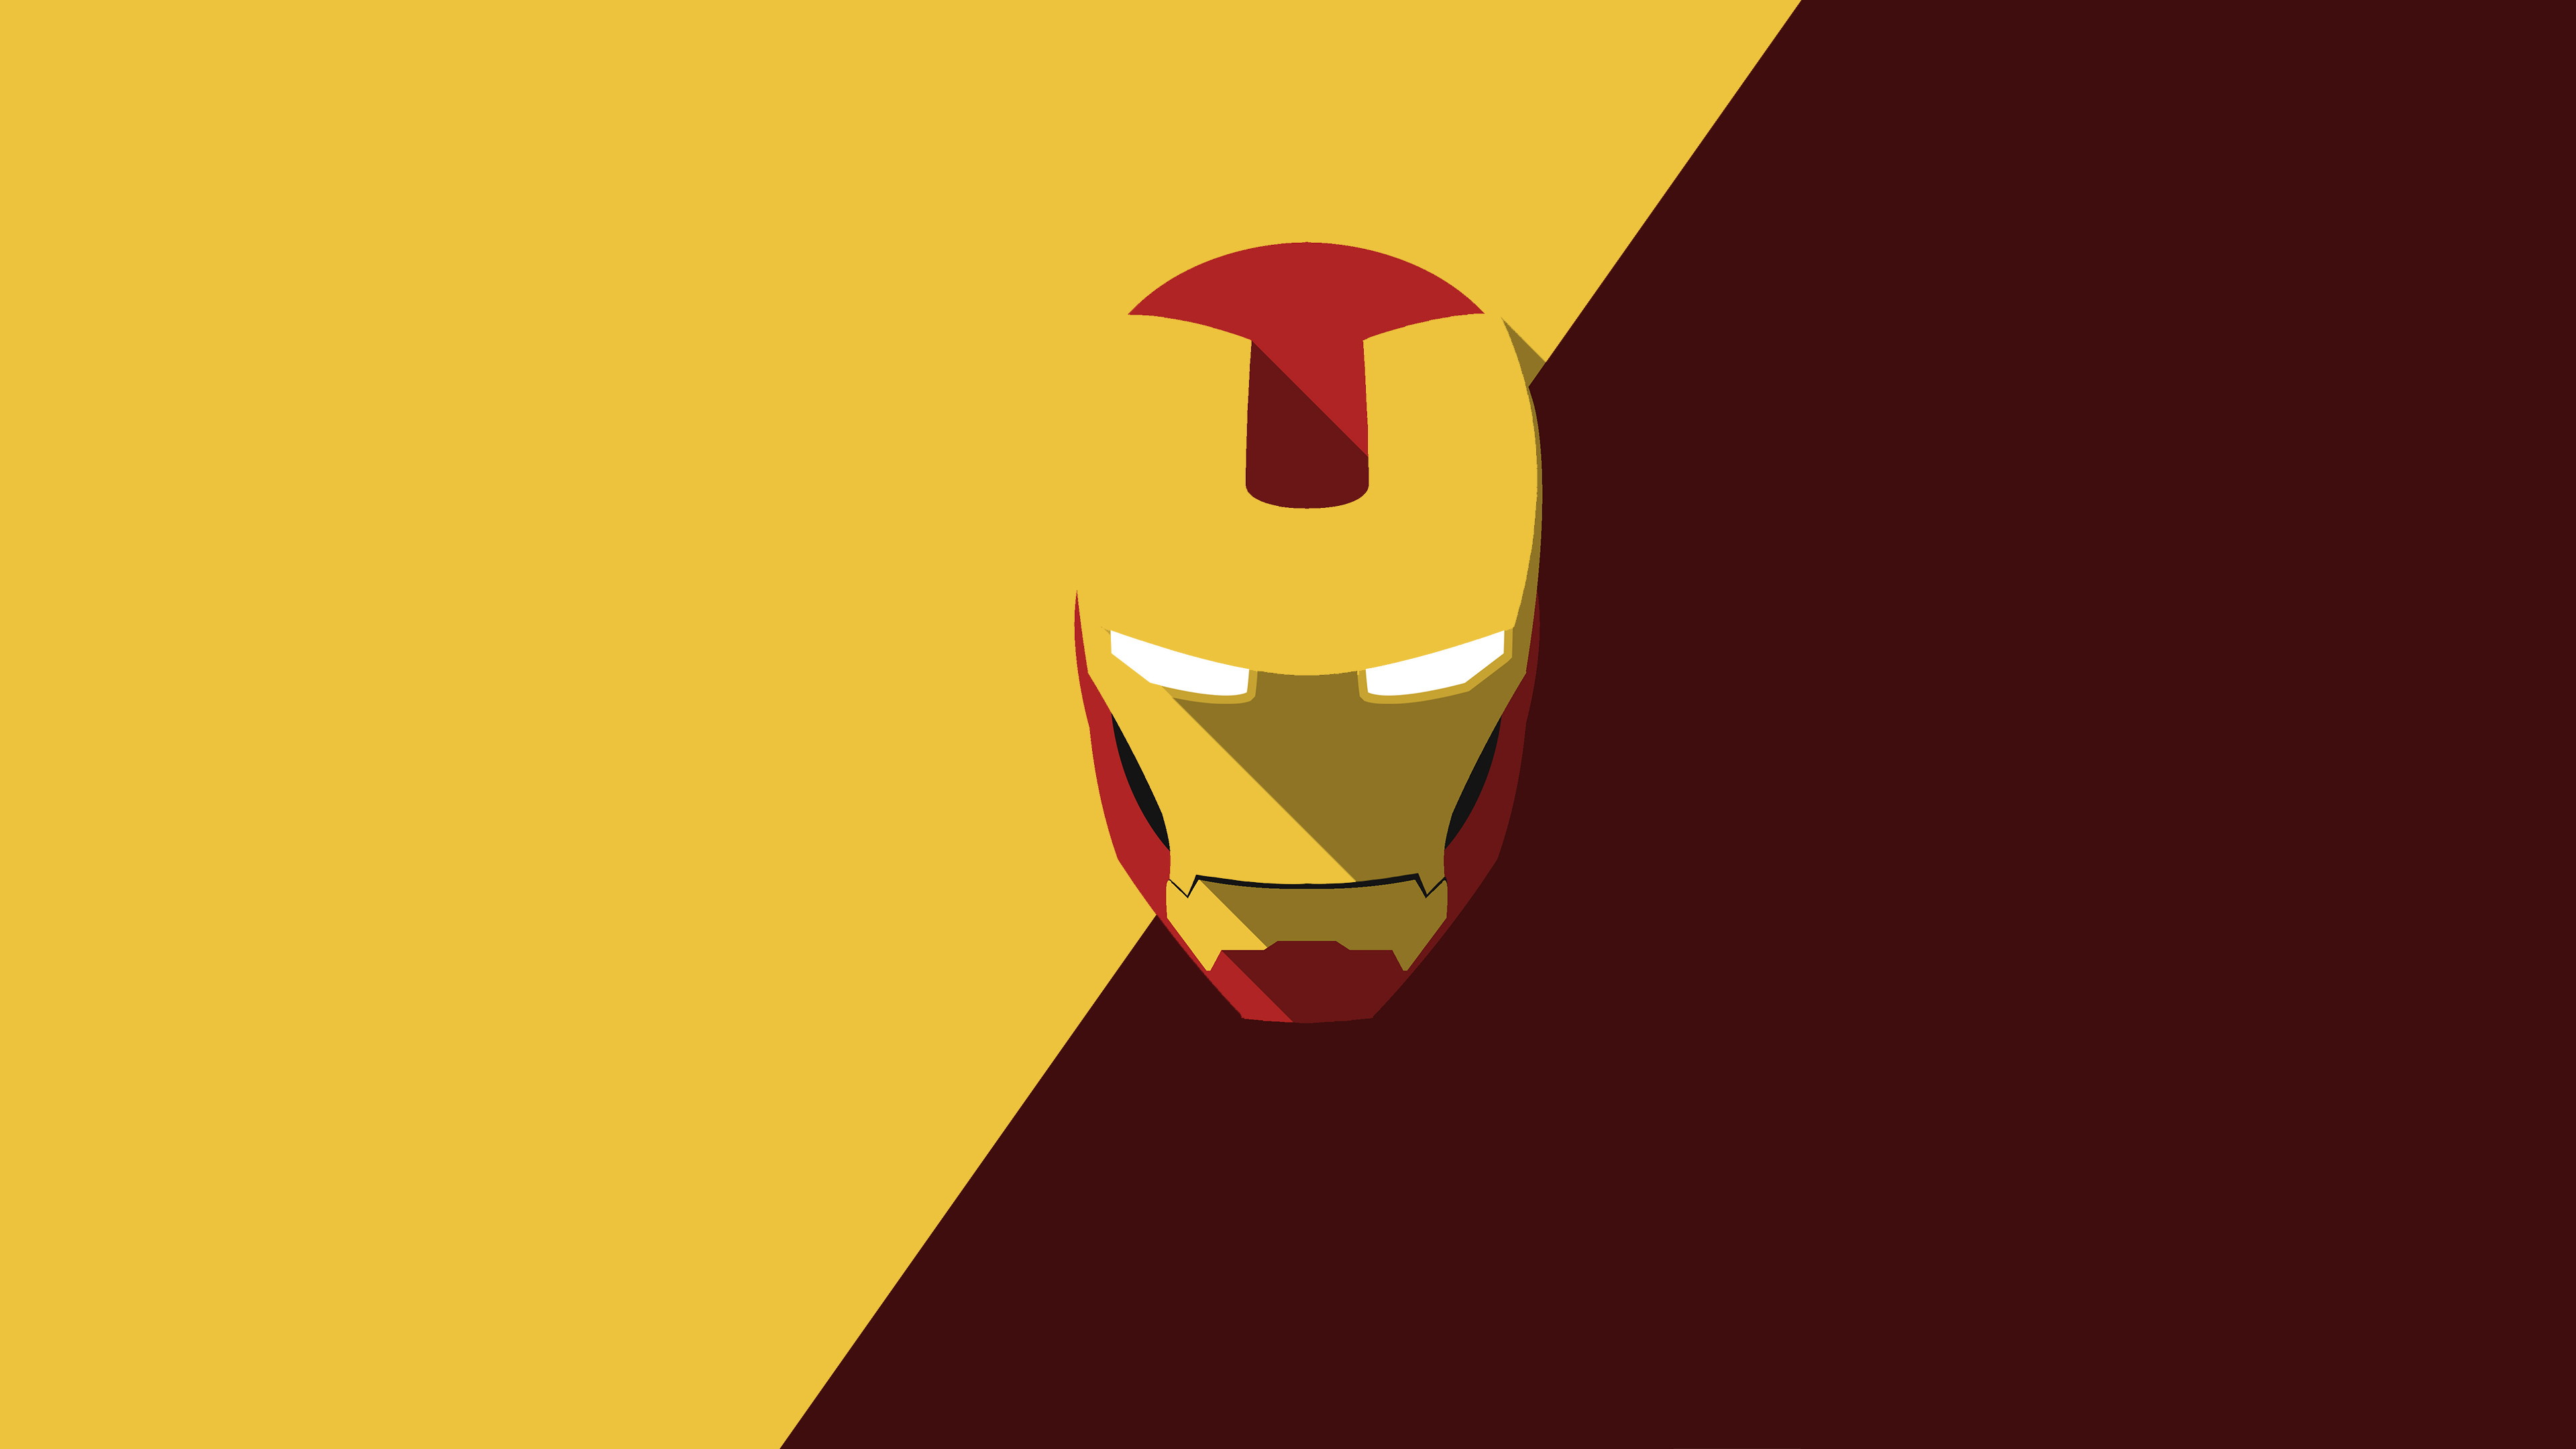 iron man minimalism 4k 2018 1539452812 - Iron Man Minimalism 4k 2018 - superheroes wallpapers, minimalism wallpapers, iron man wallpapers, hd-wallpapers, digital art wallpapers, behance wallpapers, artwork wallpapers, 4k-wallpapers